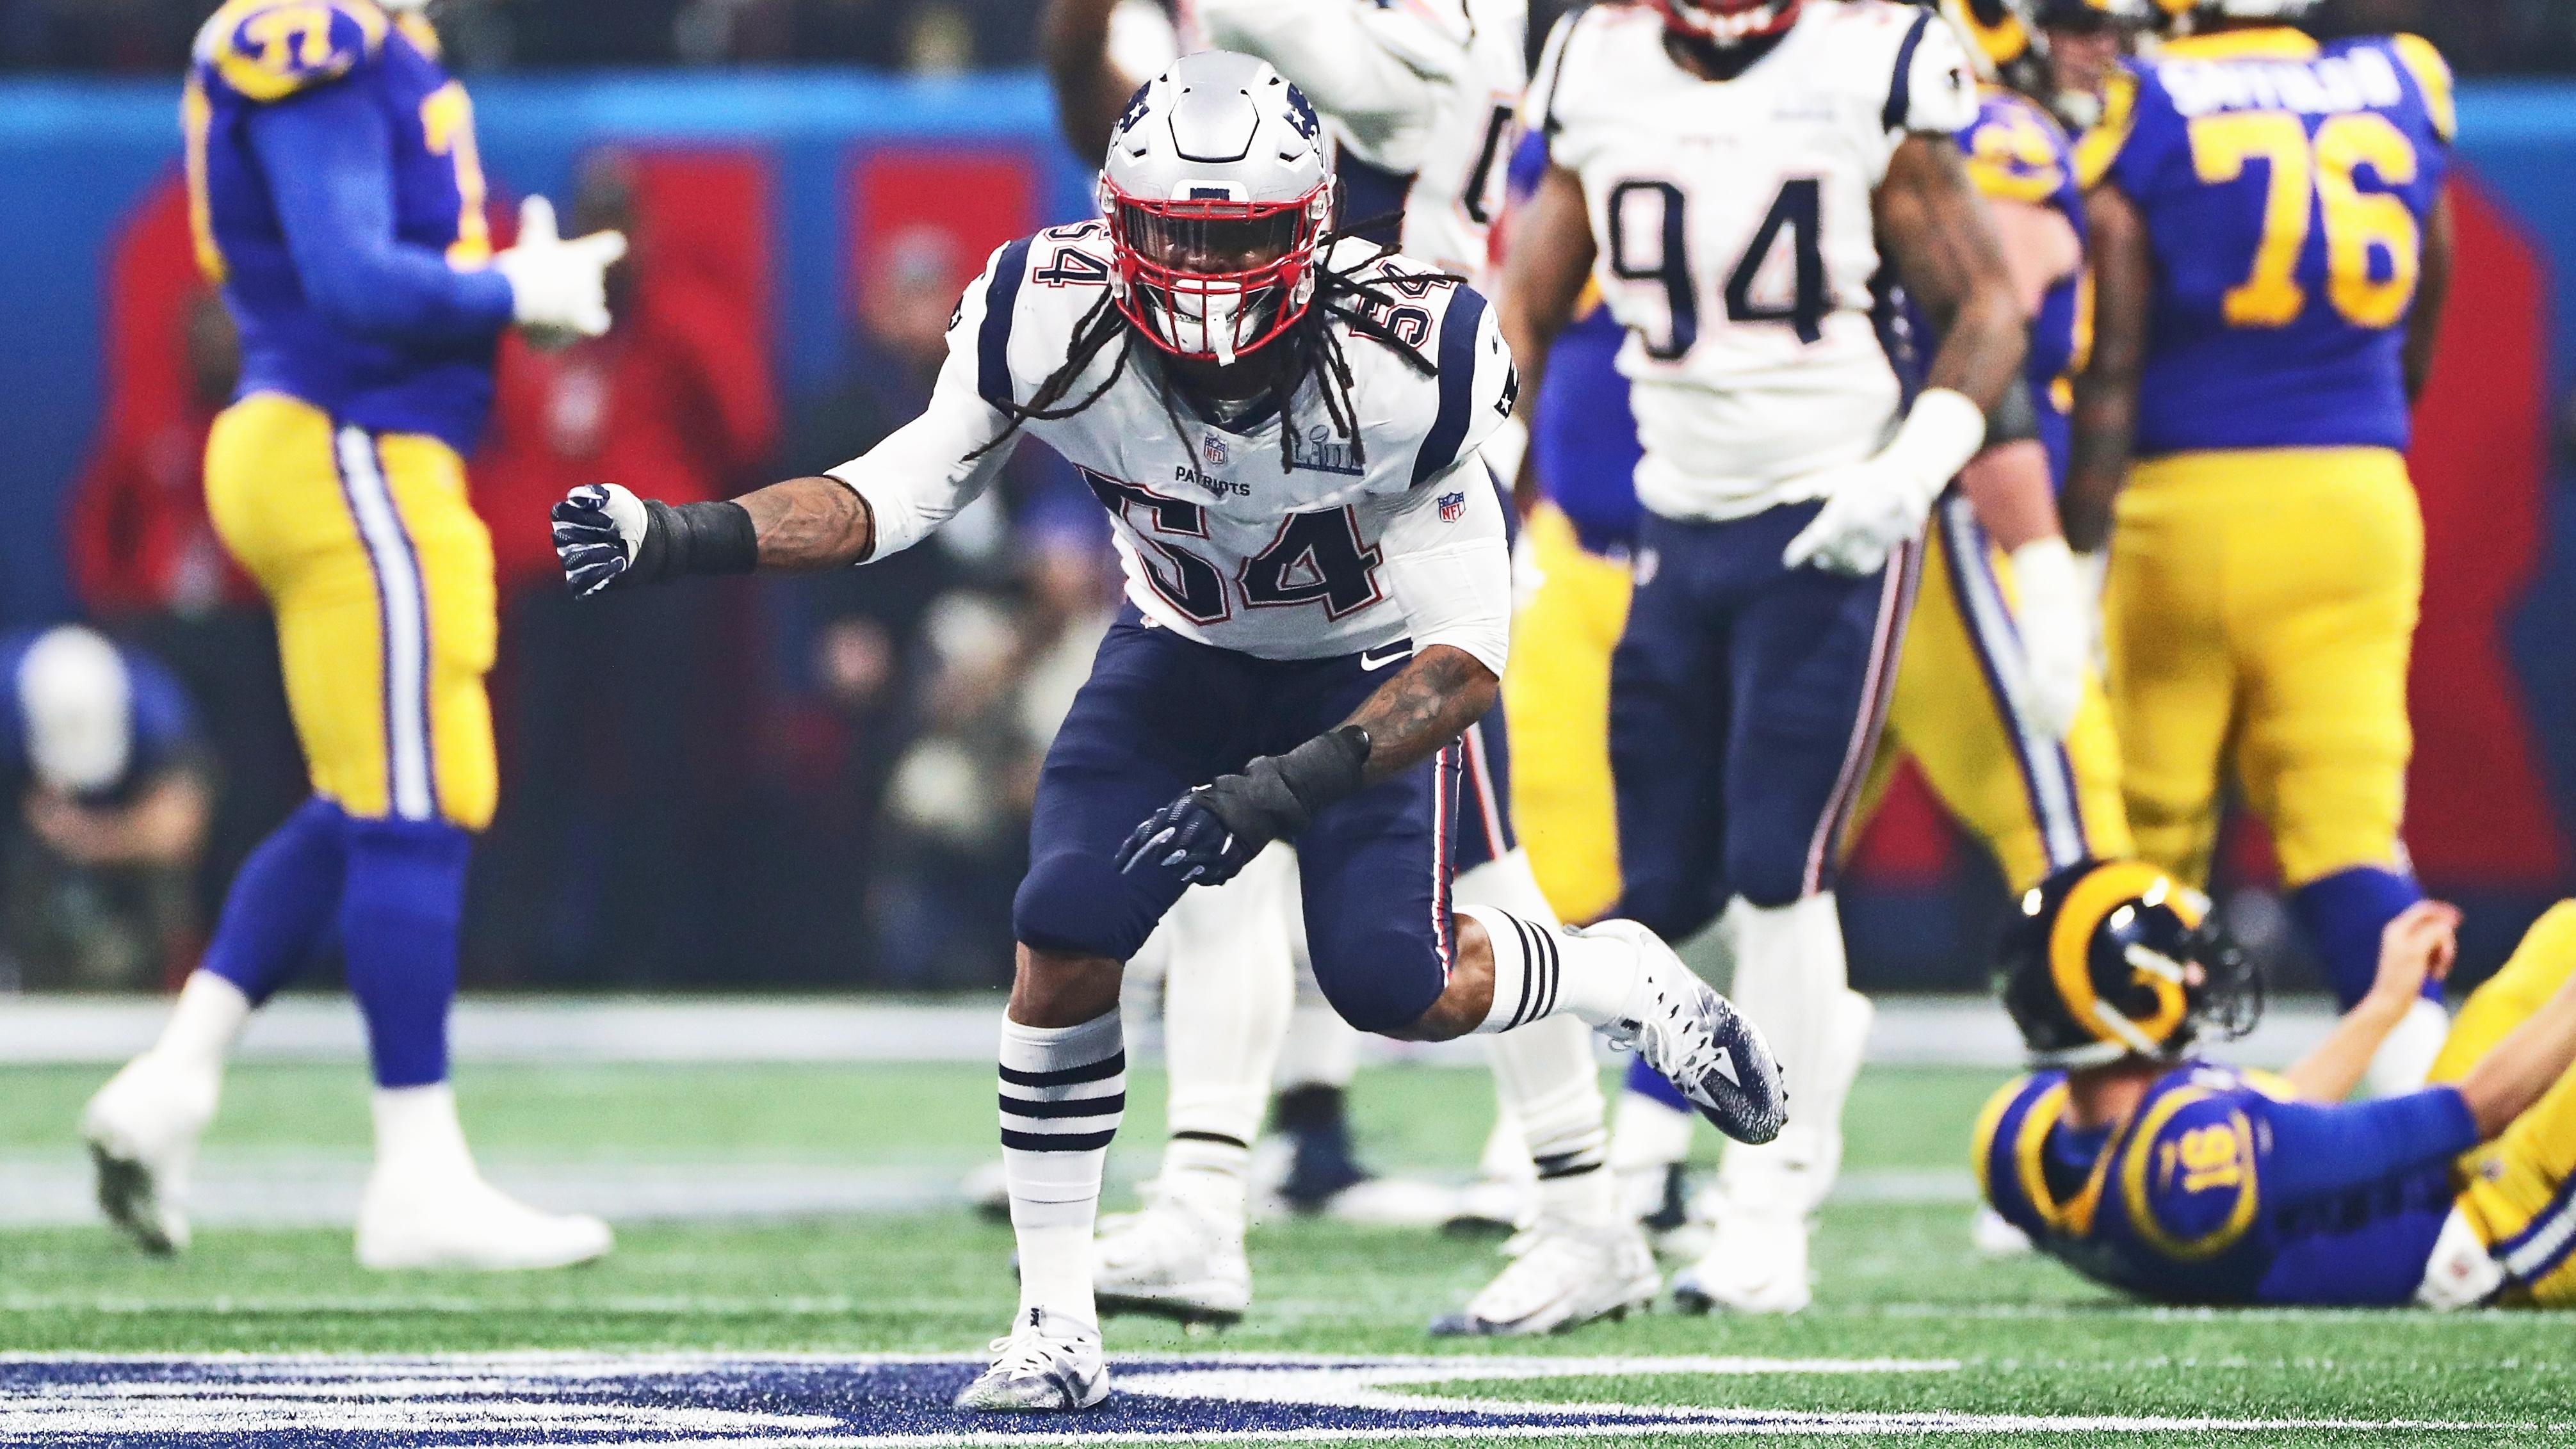 Hightower, Van Noy, Gilmore Can Be Alternate Super Bowl Mvps regarding Super Bowl 53 Mvp Voting Results